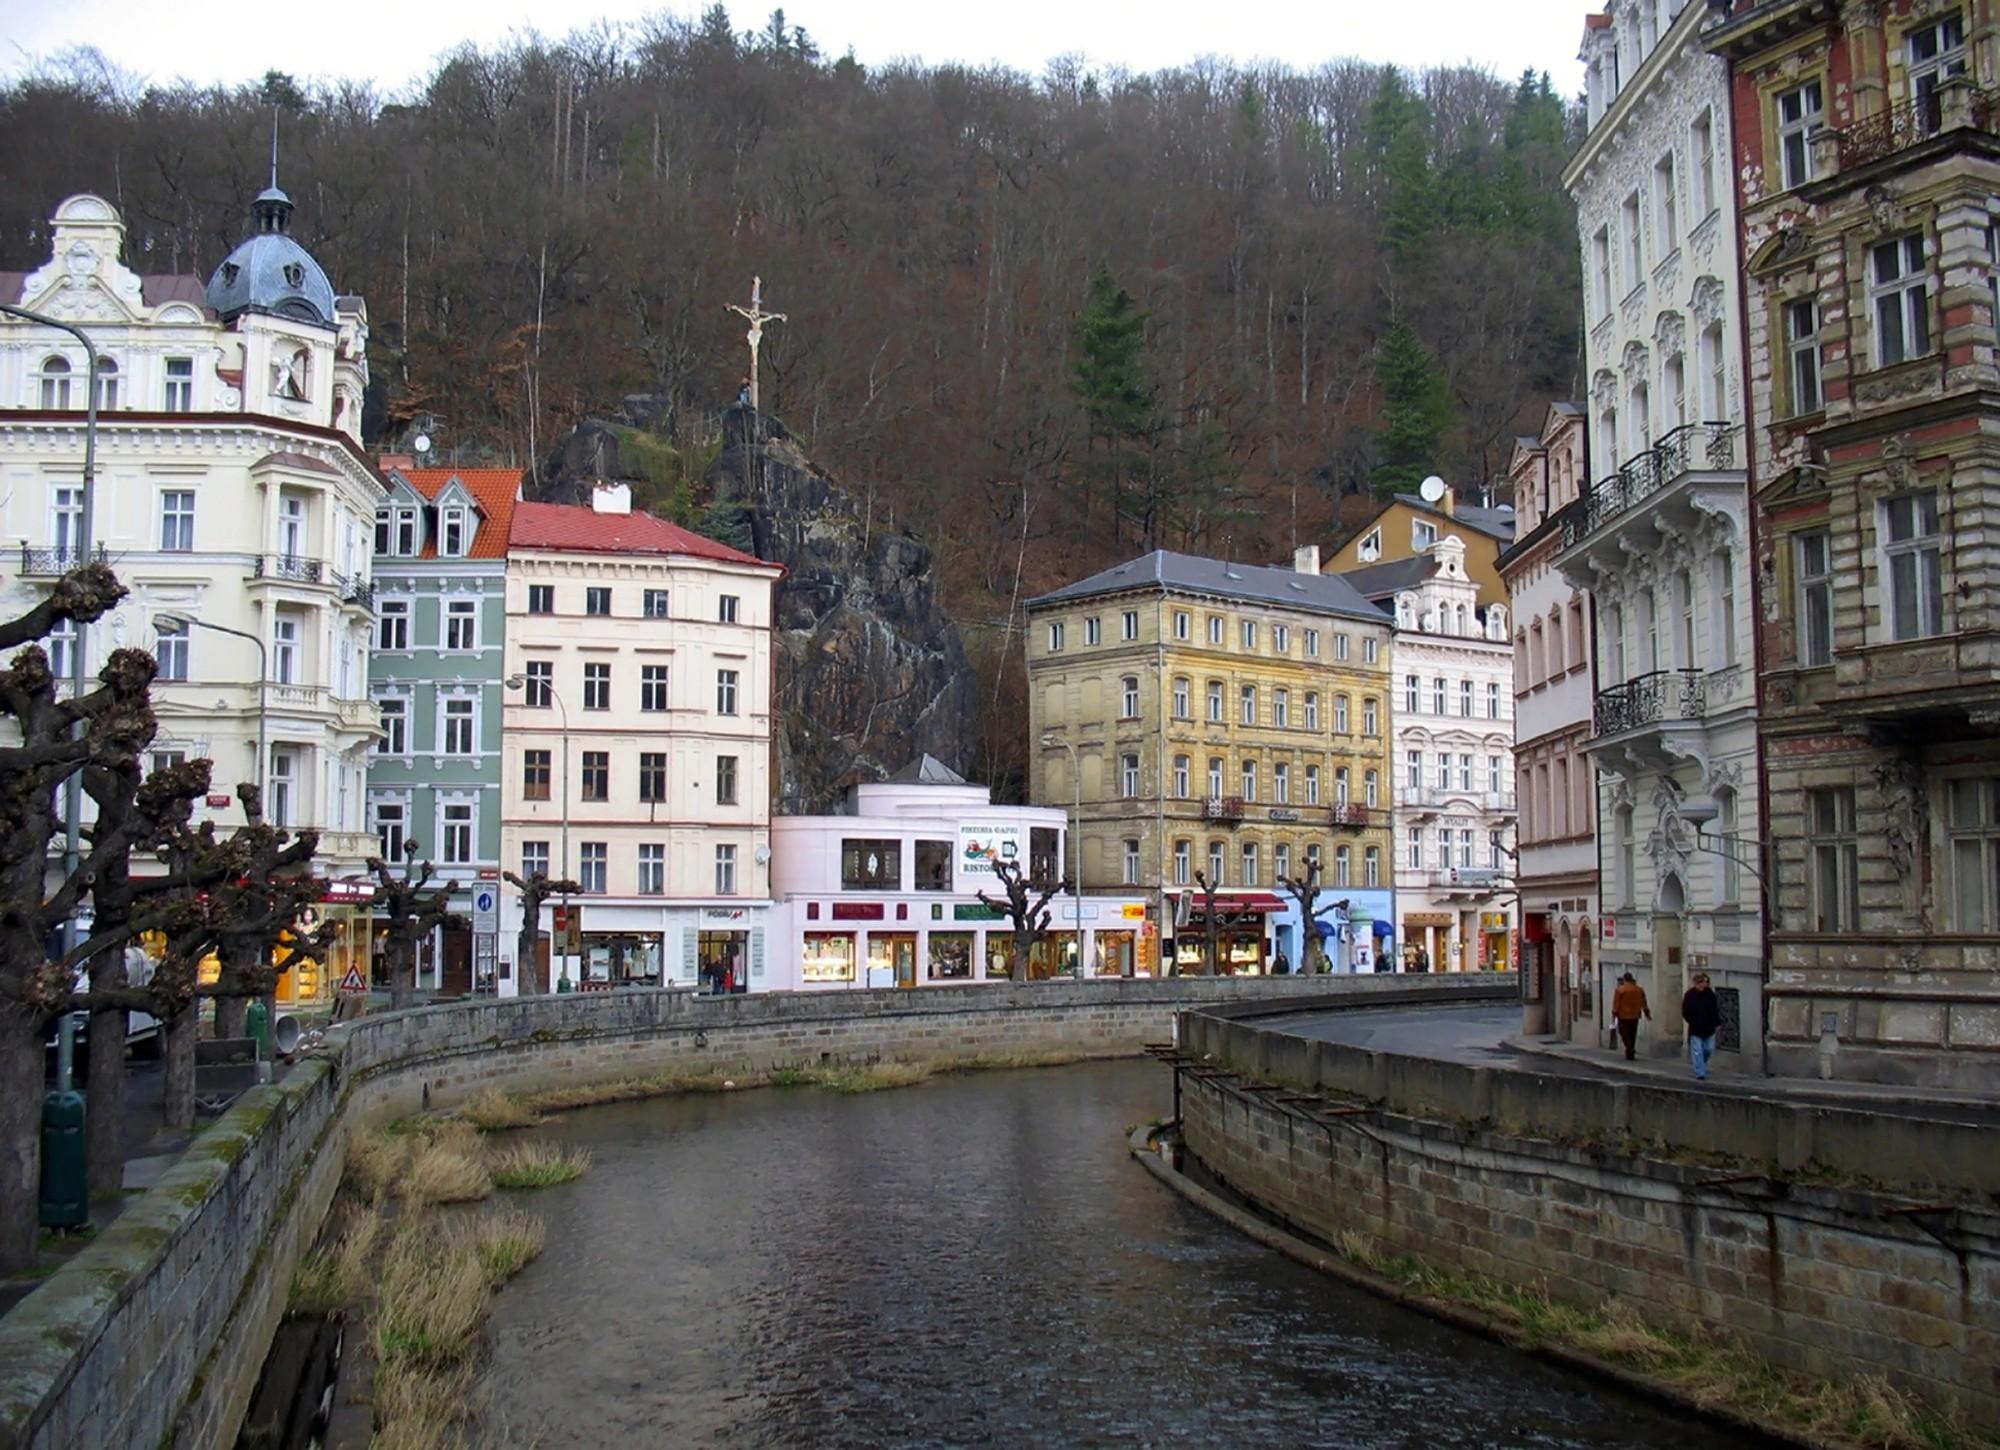 The Czech resort Karlovy Vary